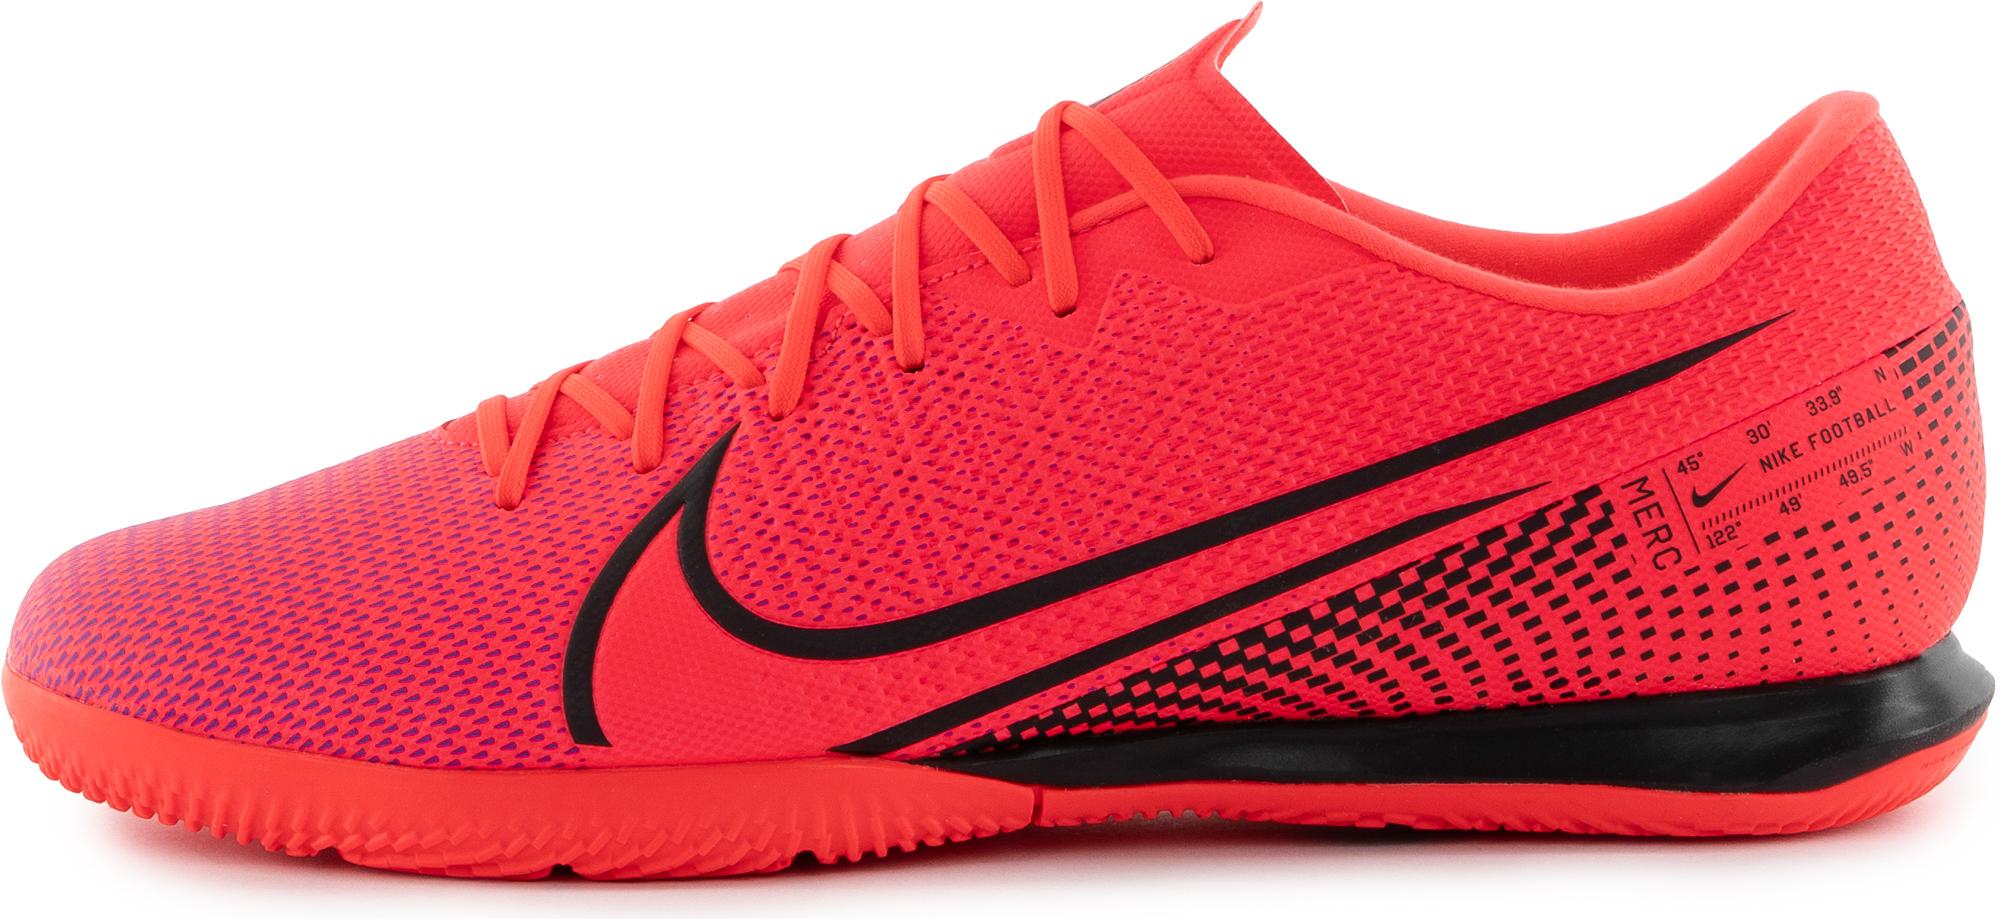 Nike Бутсы мужские Nike Mercurial Vapor 13 Academy IC, размер 40 блендер gastrorag ic ce180